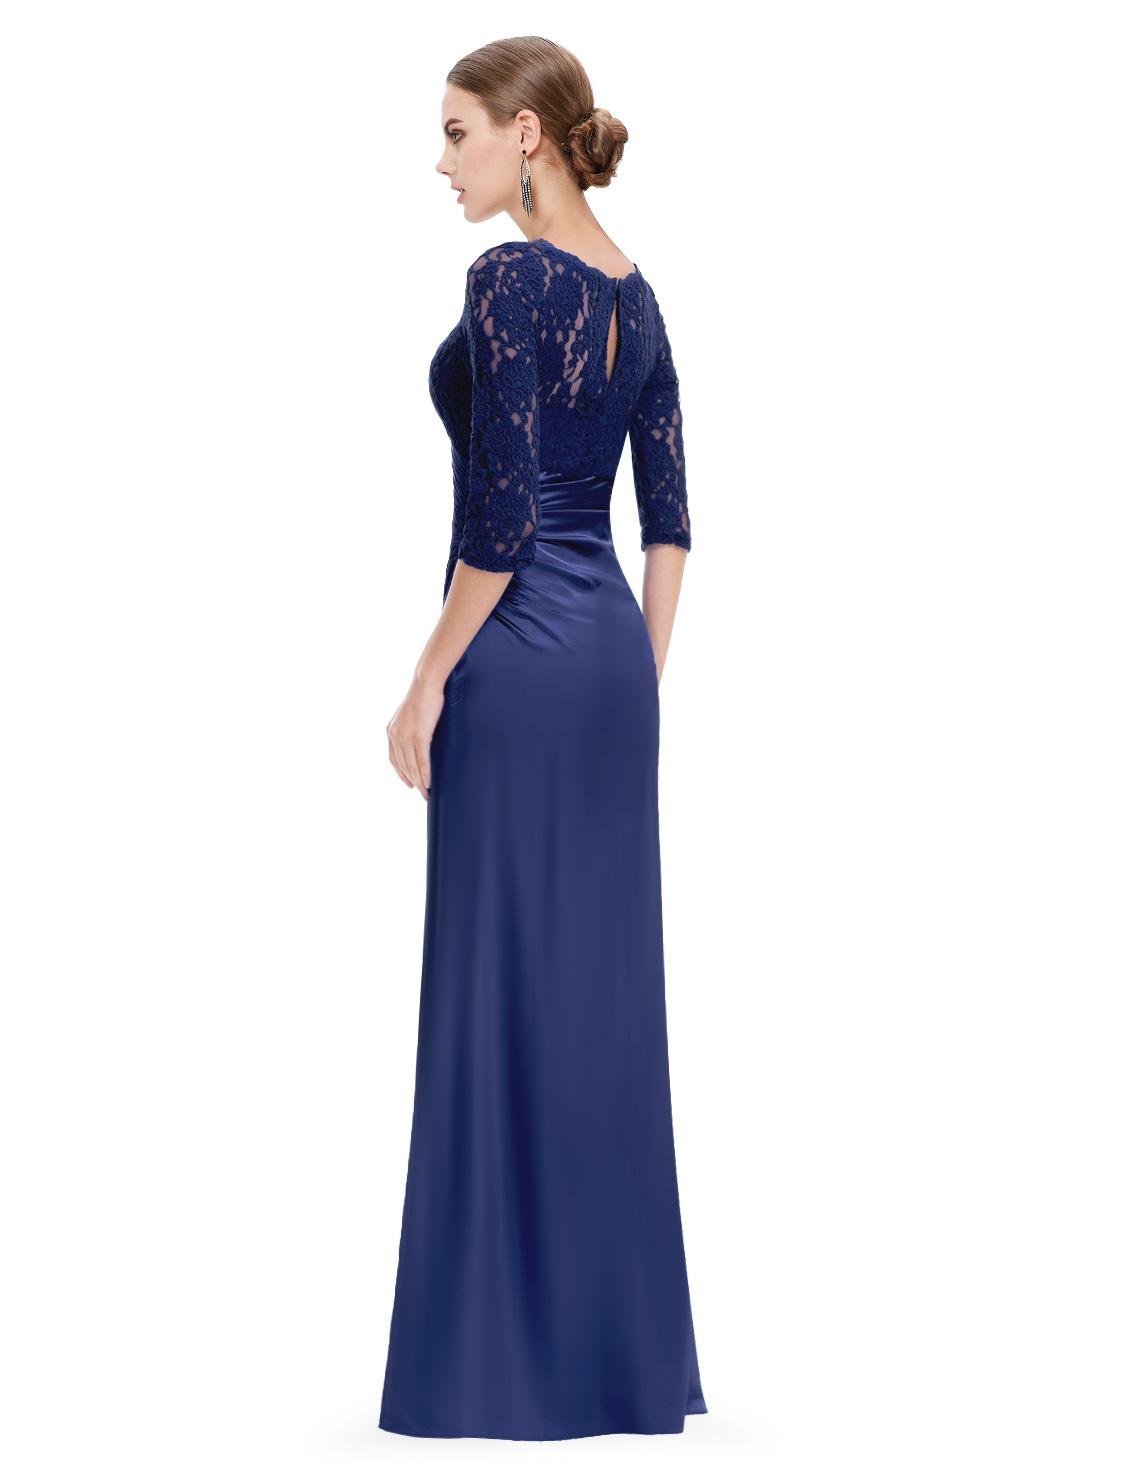 us women 3 4 long sleeve lace long formal evening dress. Black Bedroom Furniture Sets. Home Design Ideas